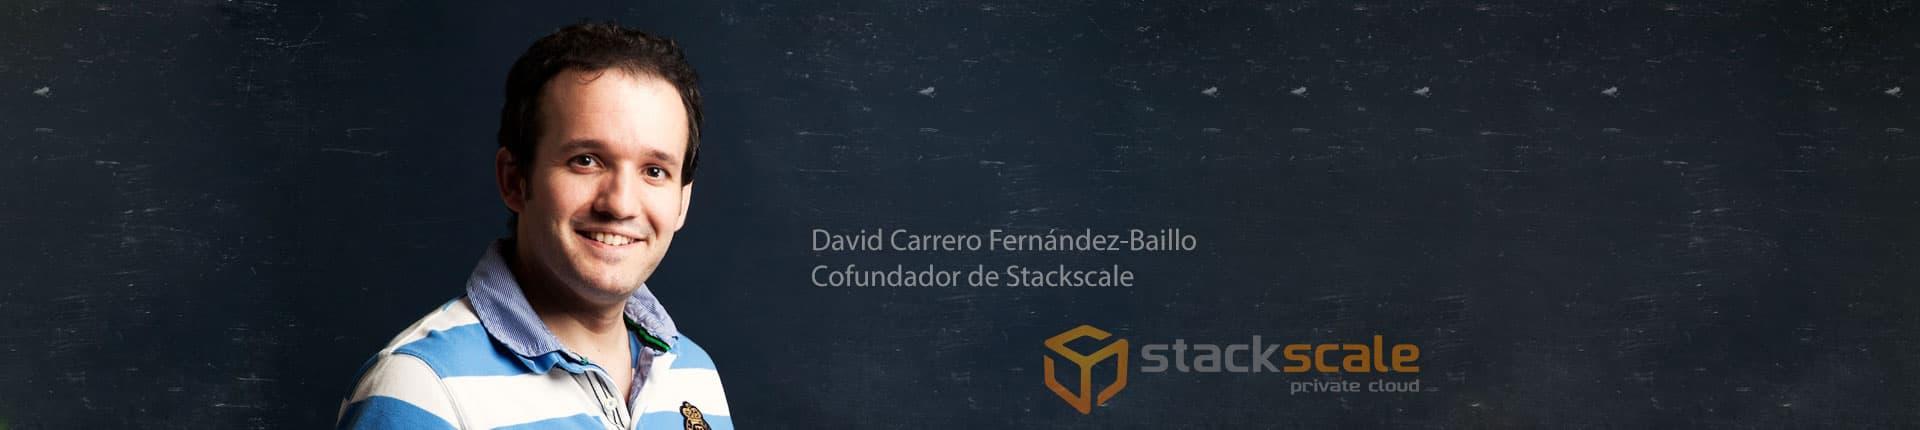 David Carrero habla de infraestructura cloud